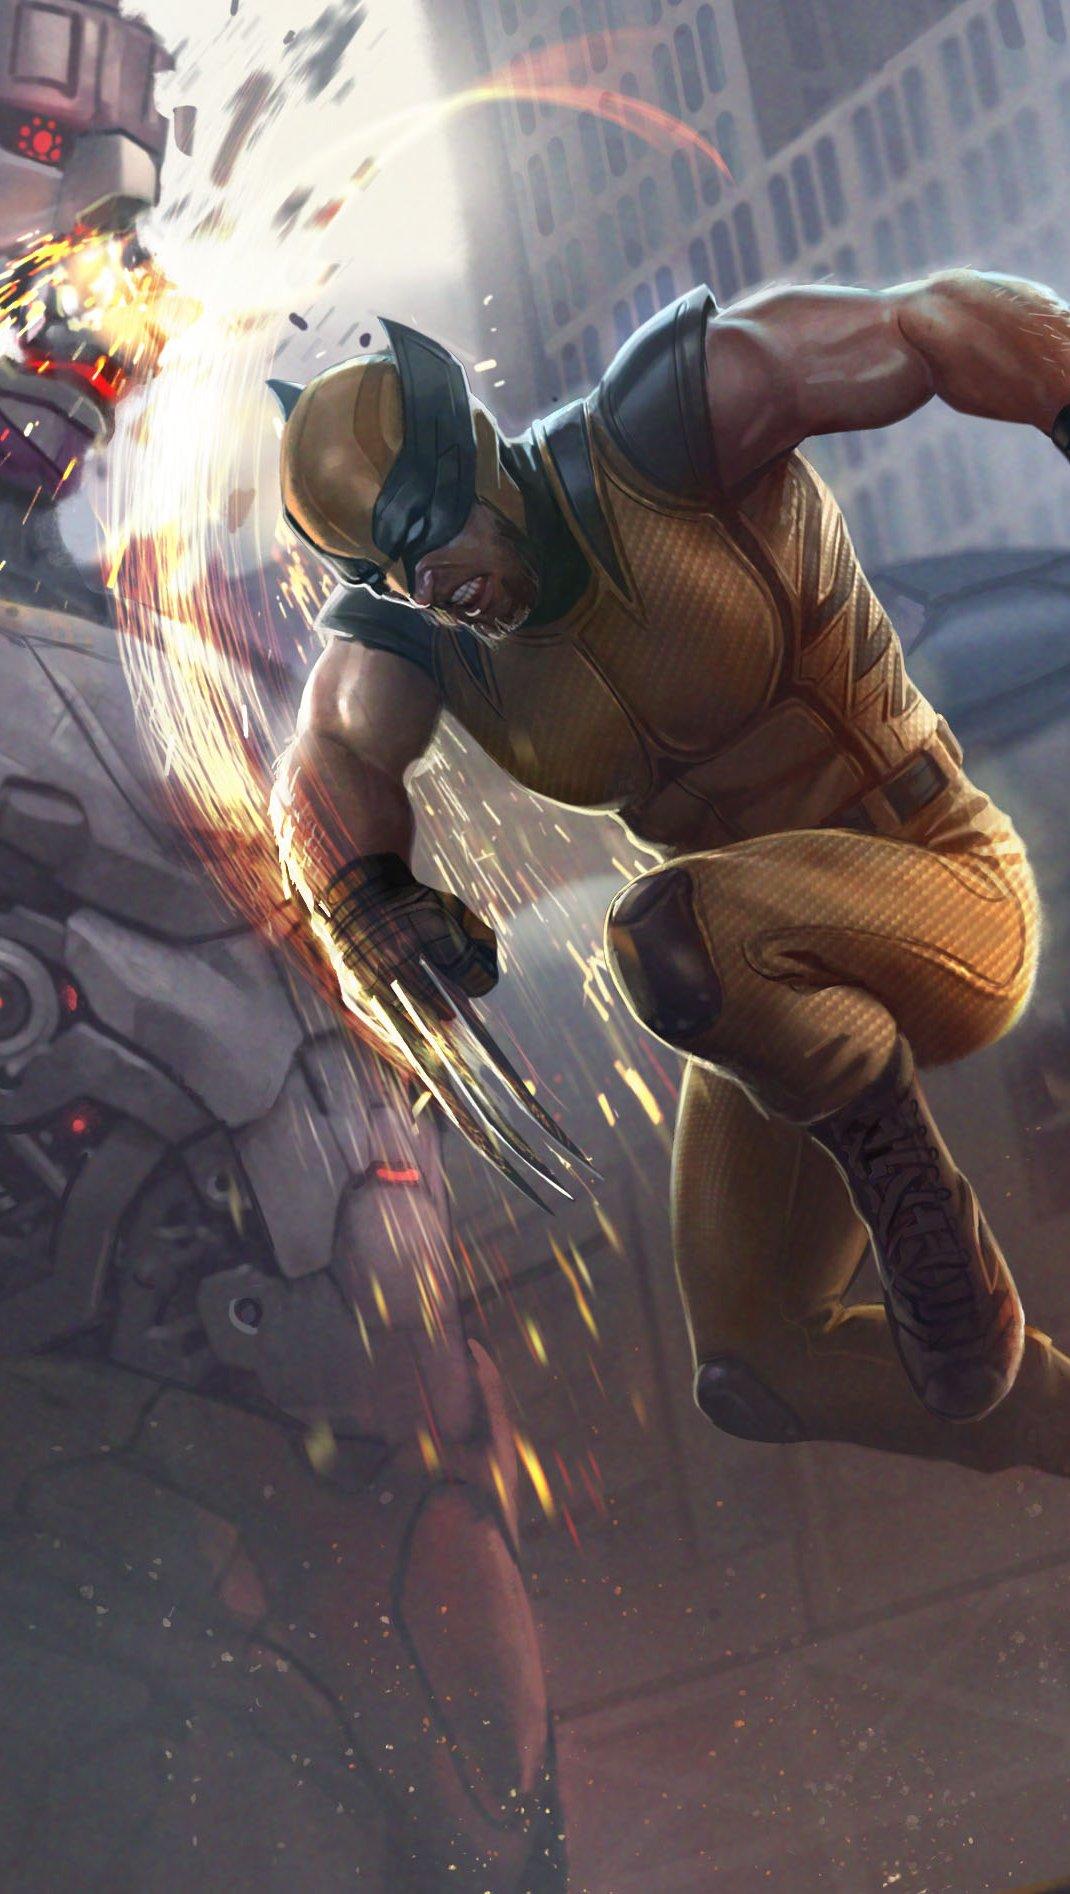 Fondos de pantalla X Men en batalla Vertical